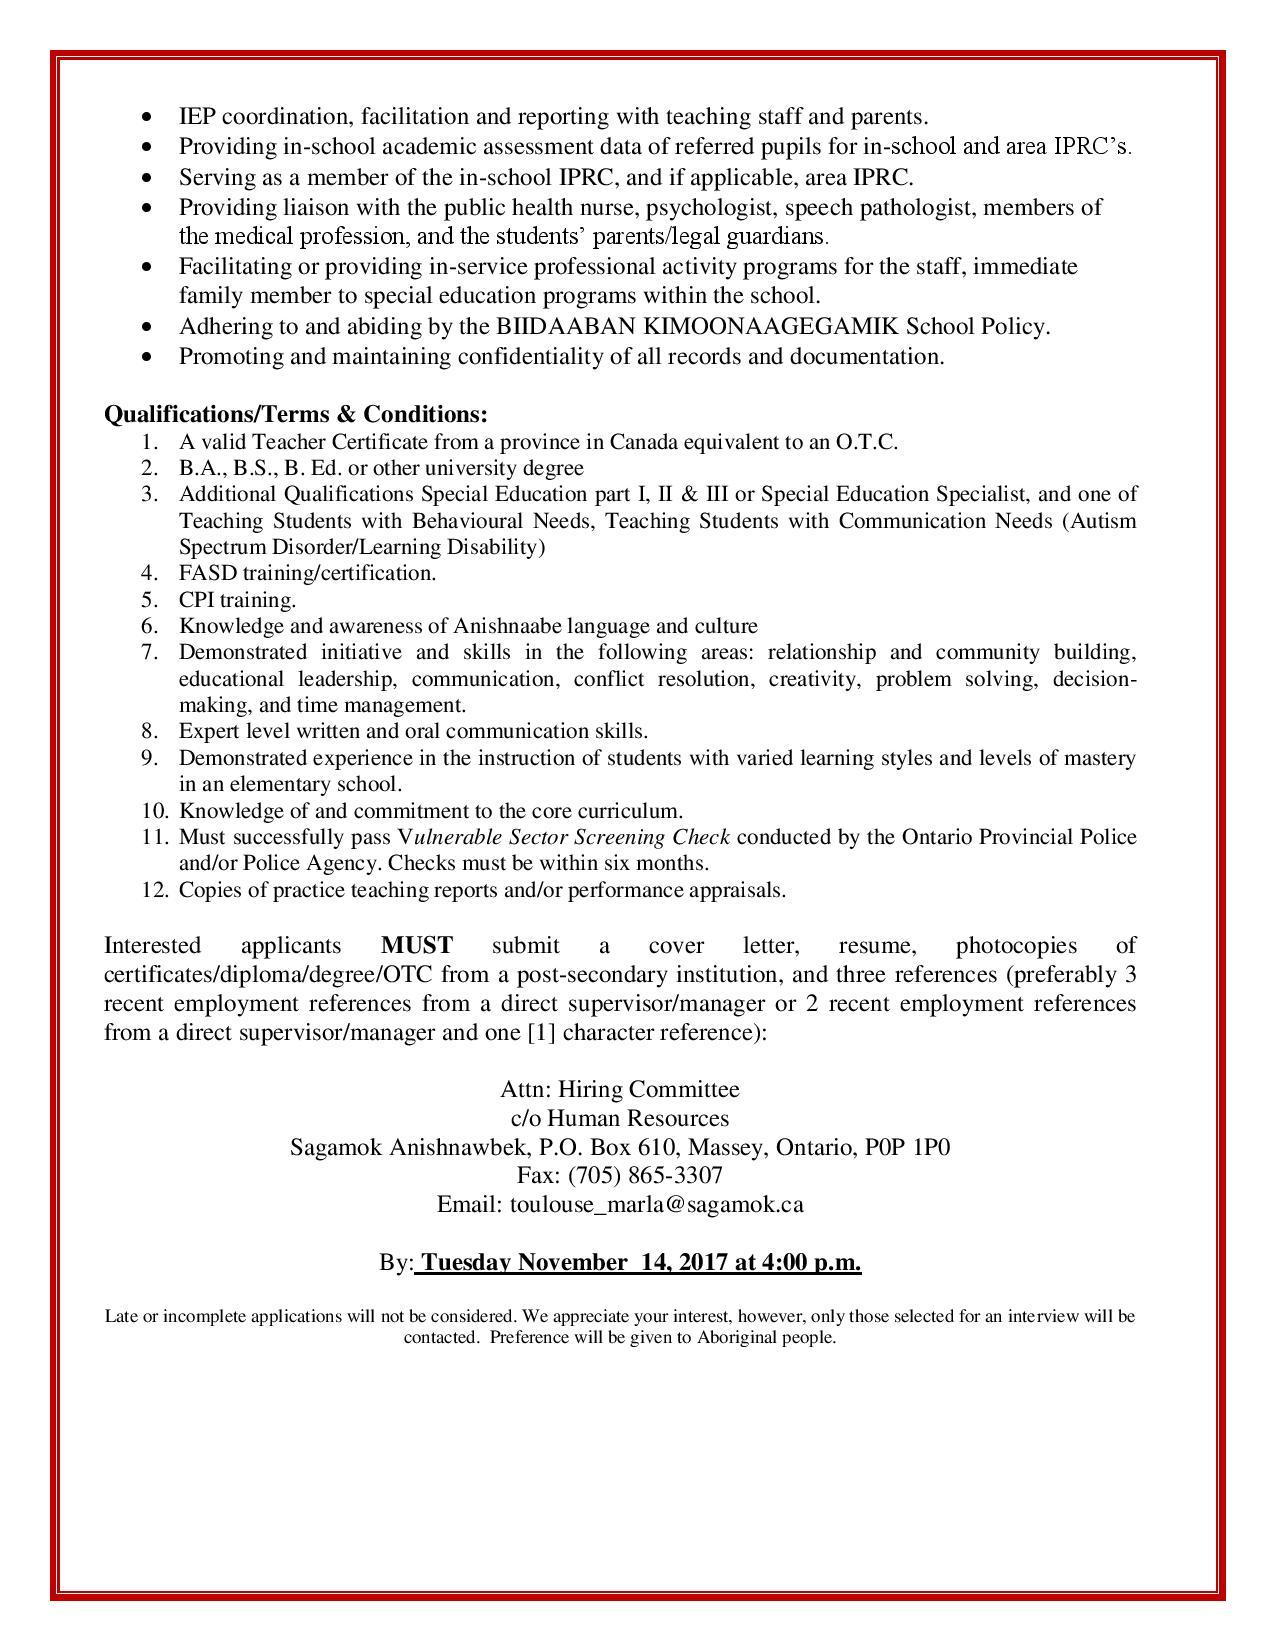 Spec Ed Teacher October 2017-page-002.jpg